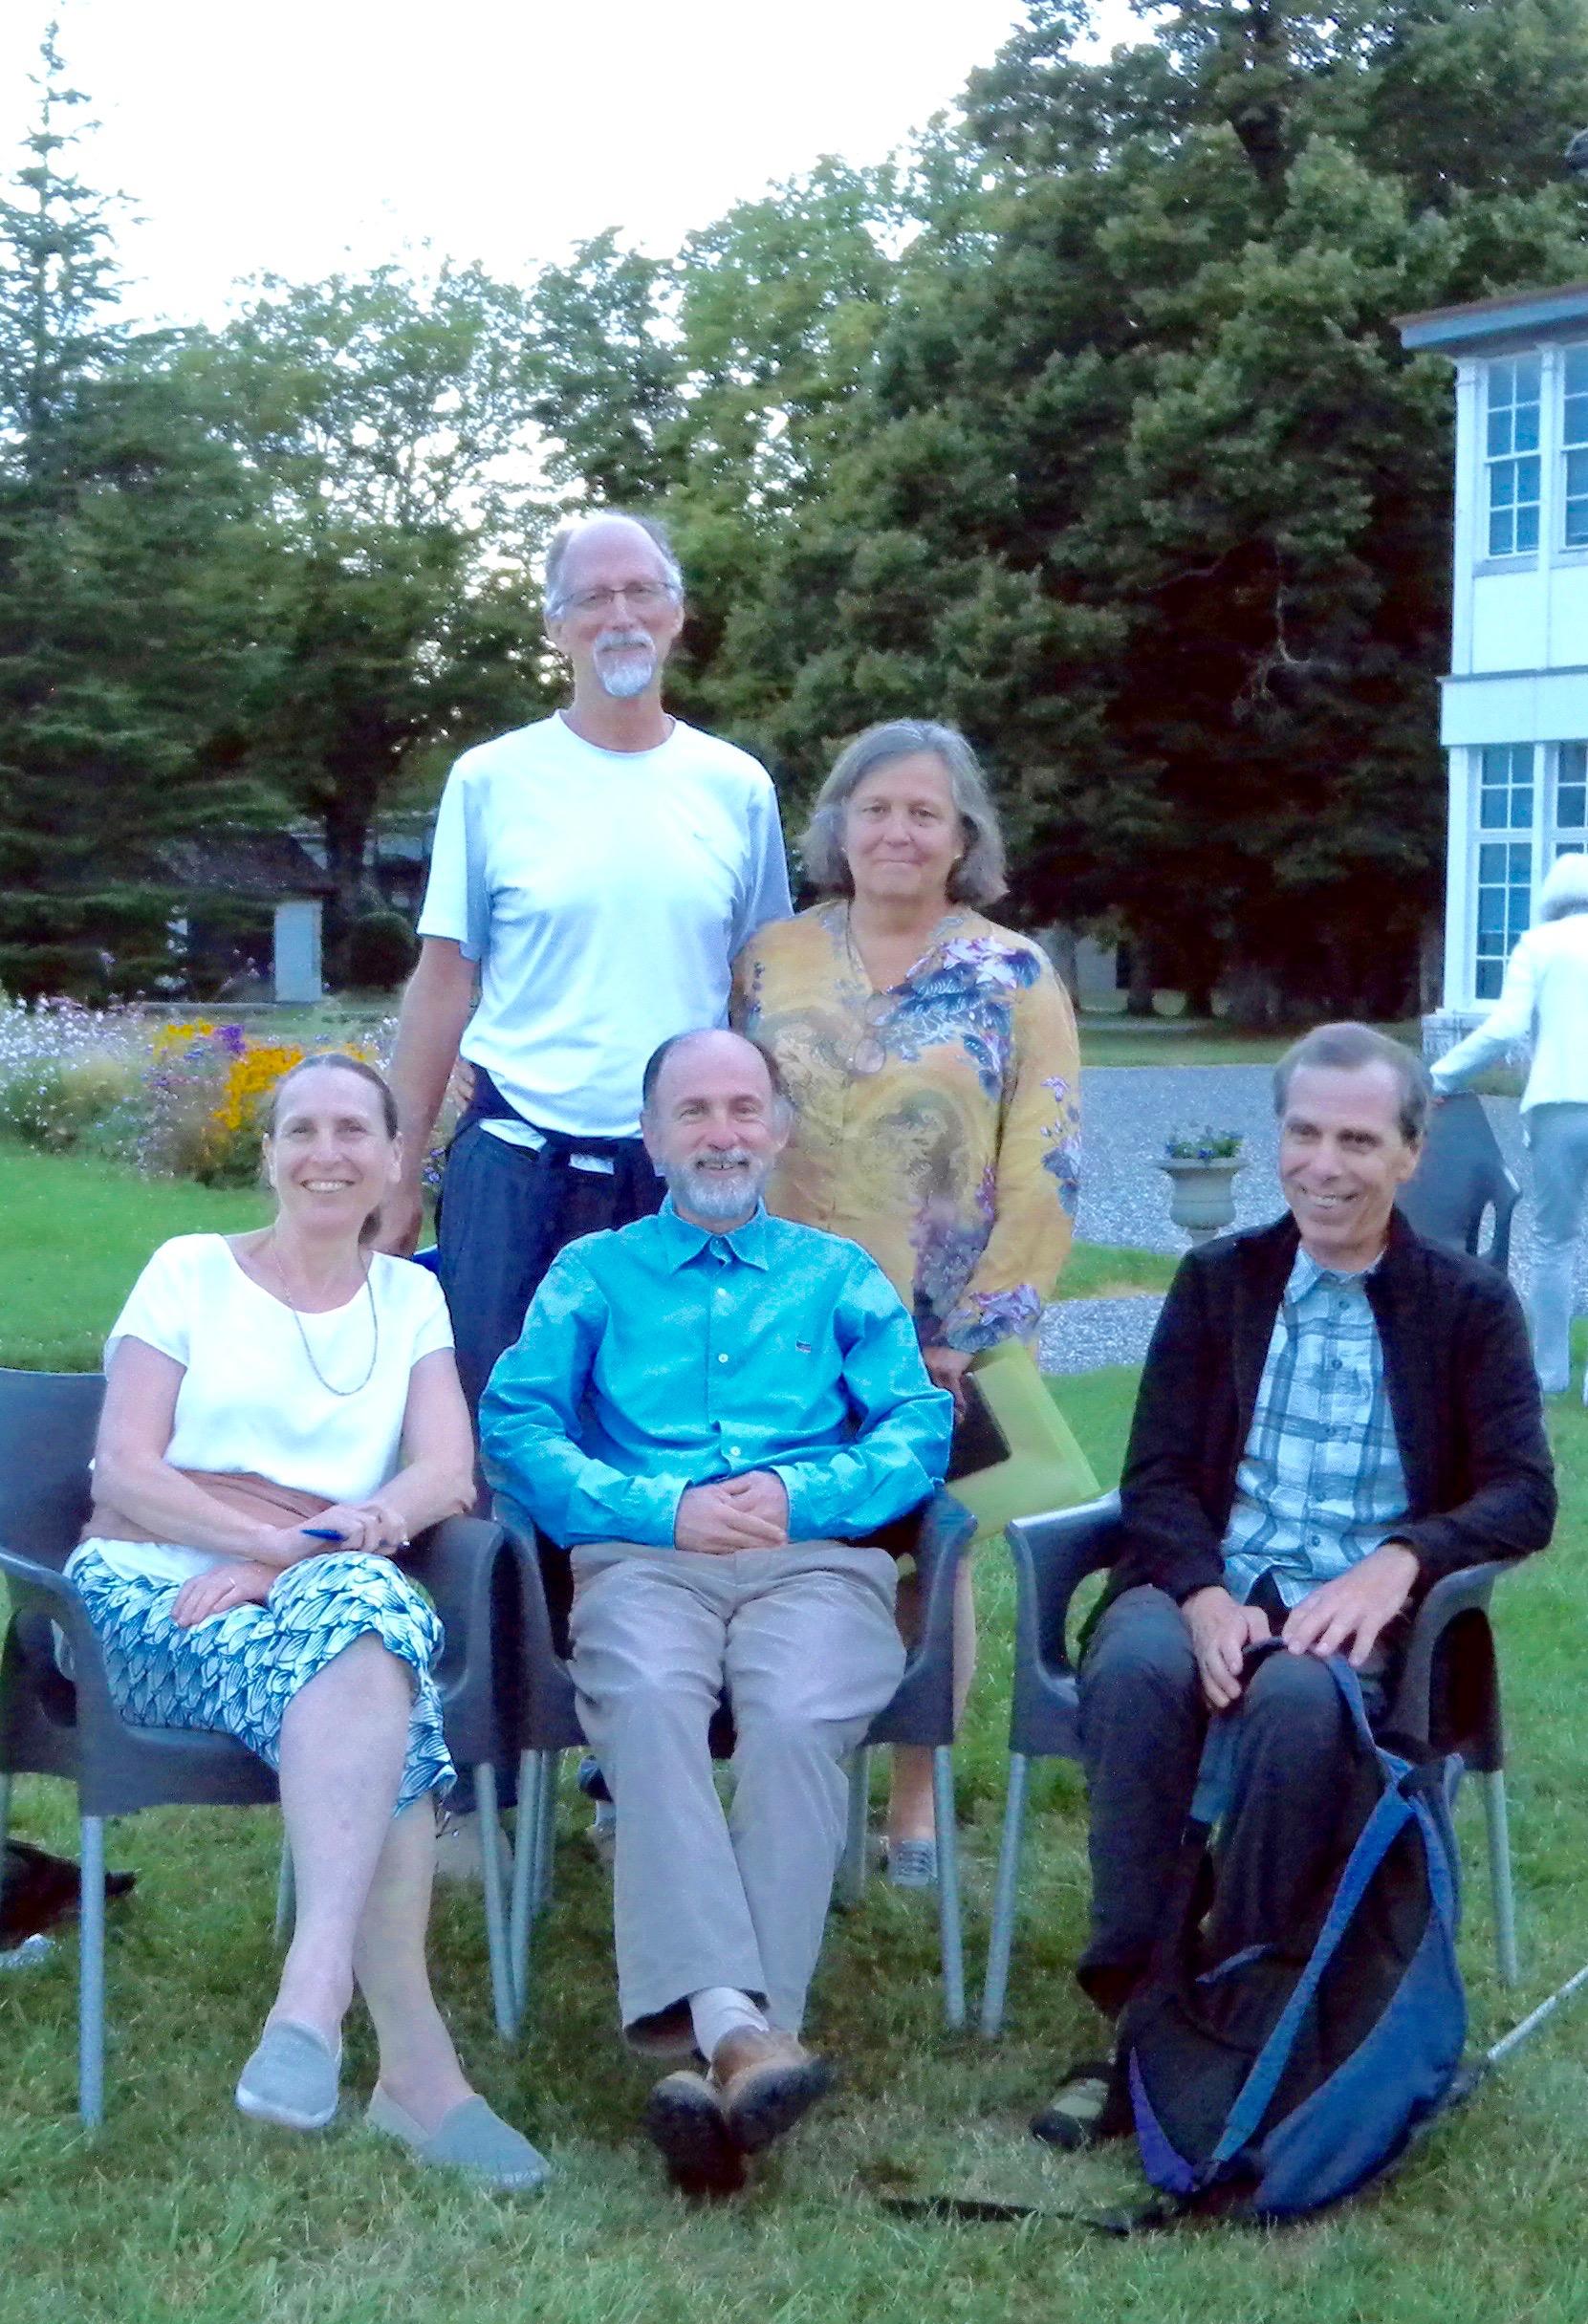 Mentors_seniors_du_College_of_Tao_à_Bossey_Chi_Rivers_Genève_Suisse.jpg